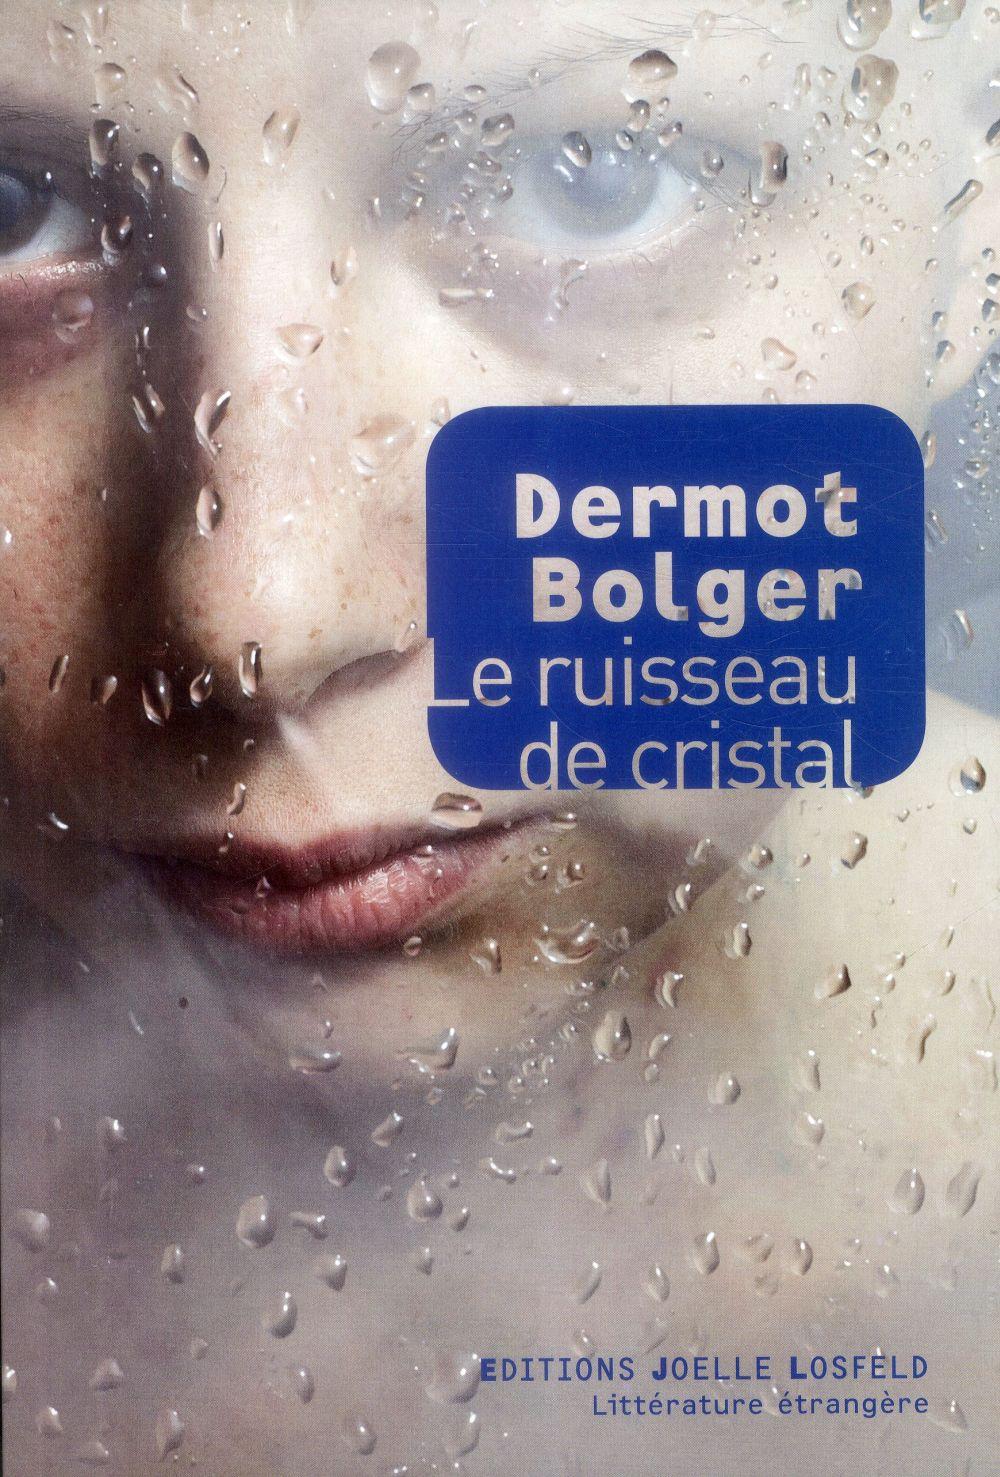 Le ruisseau de cristal